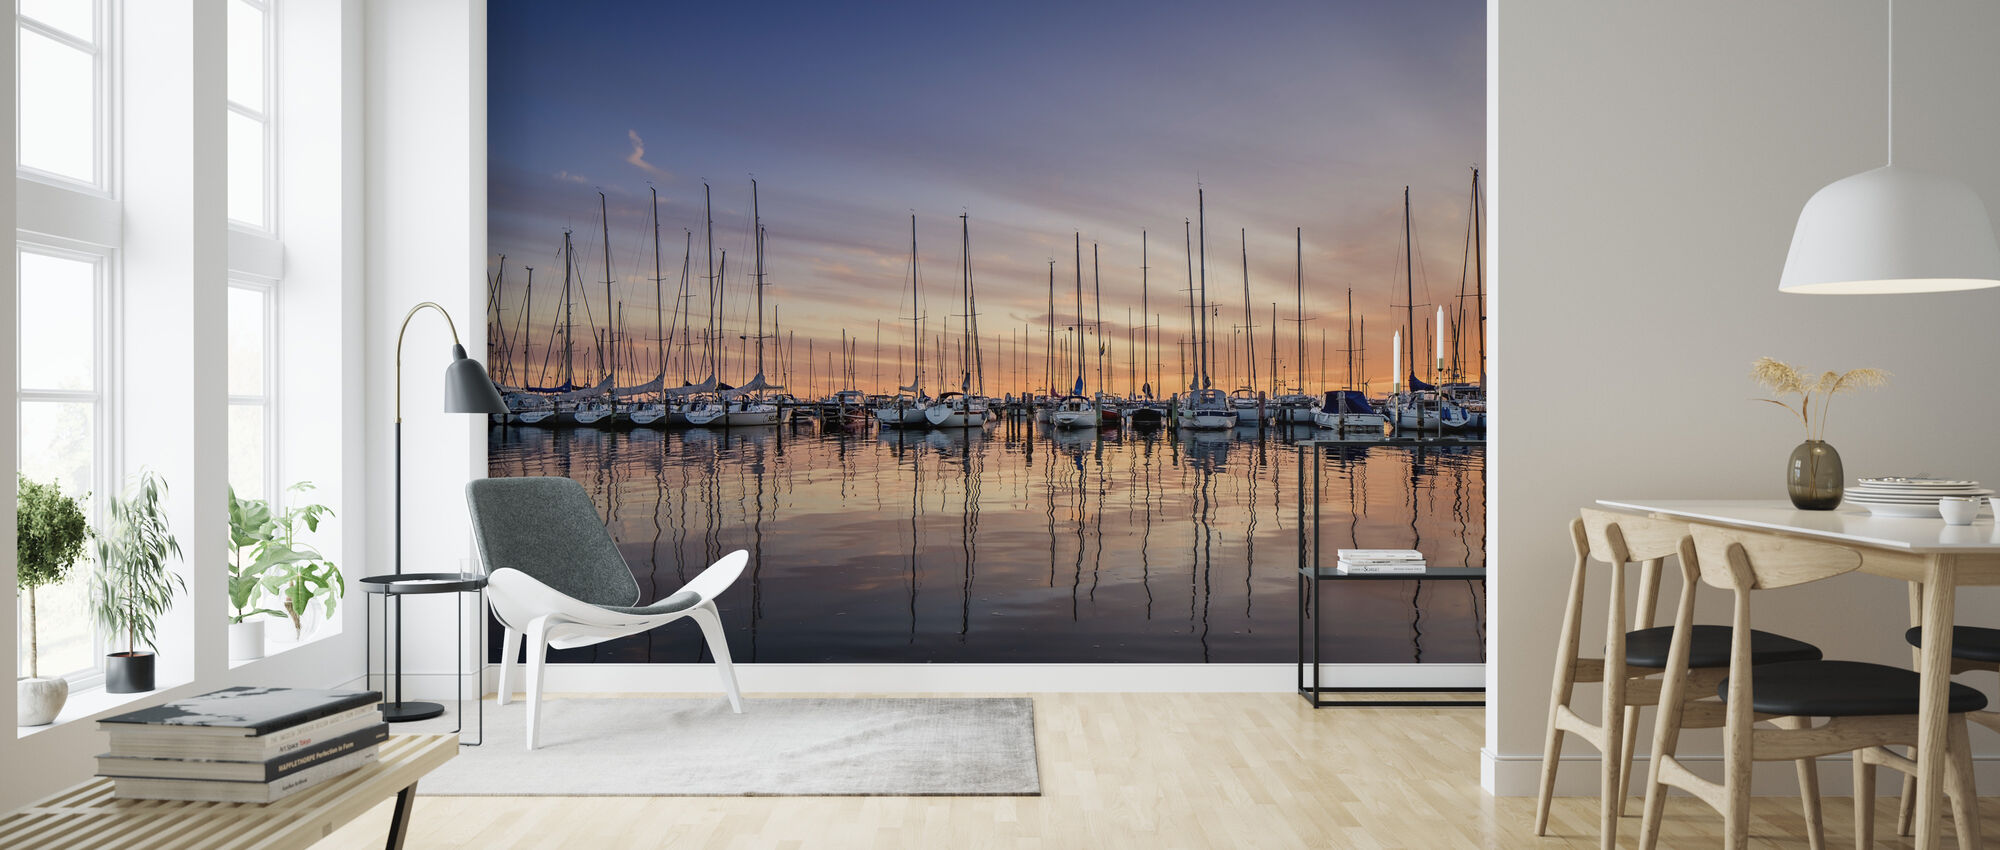 Sailboats in Sunset, Gothenburg Sweden - Wallpaper - Living Room